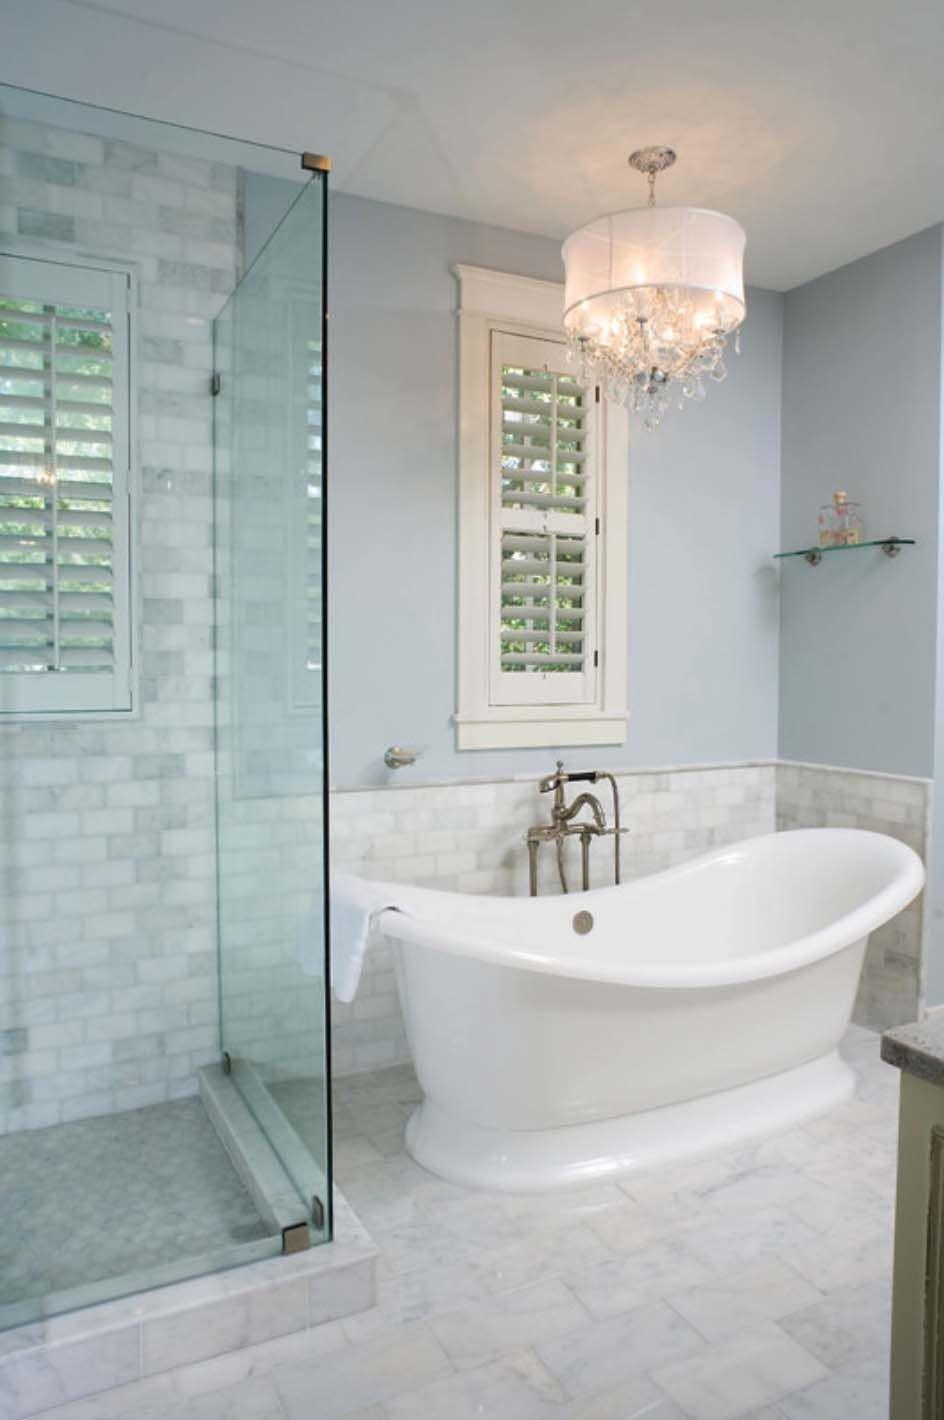 38 Amazing freestanding tubs for a bathroom spa sanctuary | BATHROOM ...